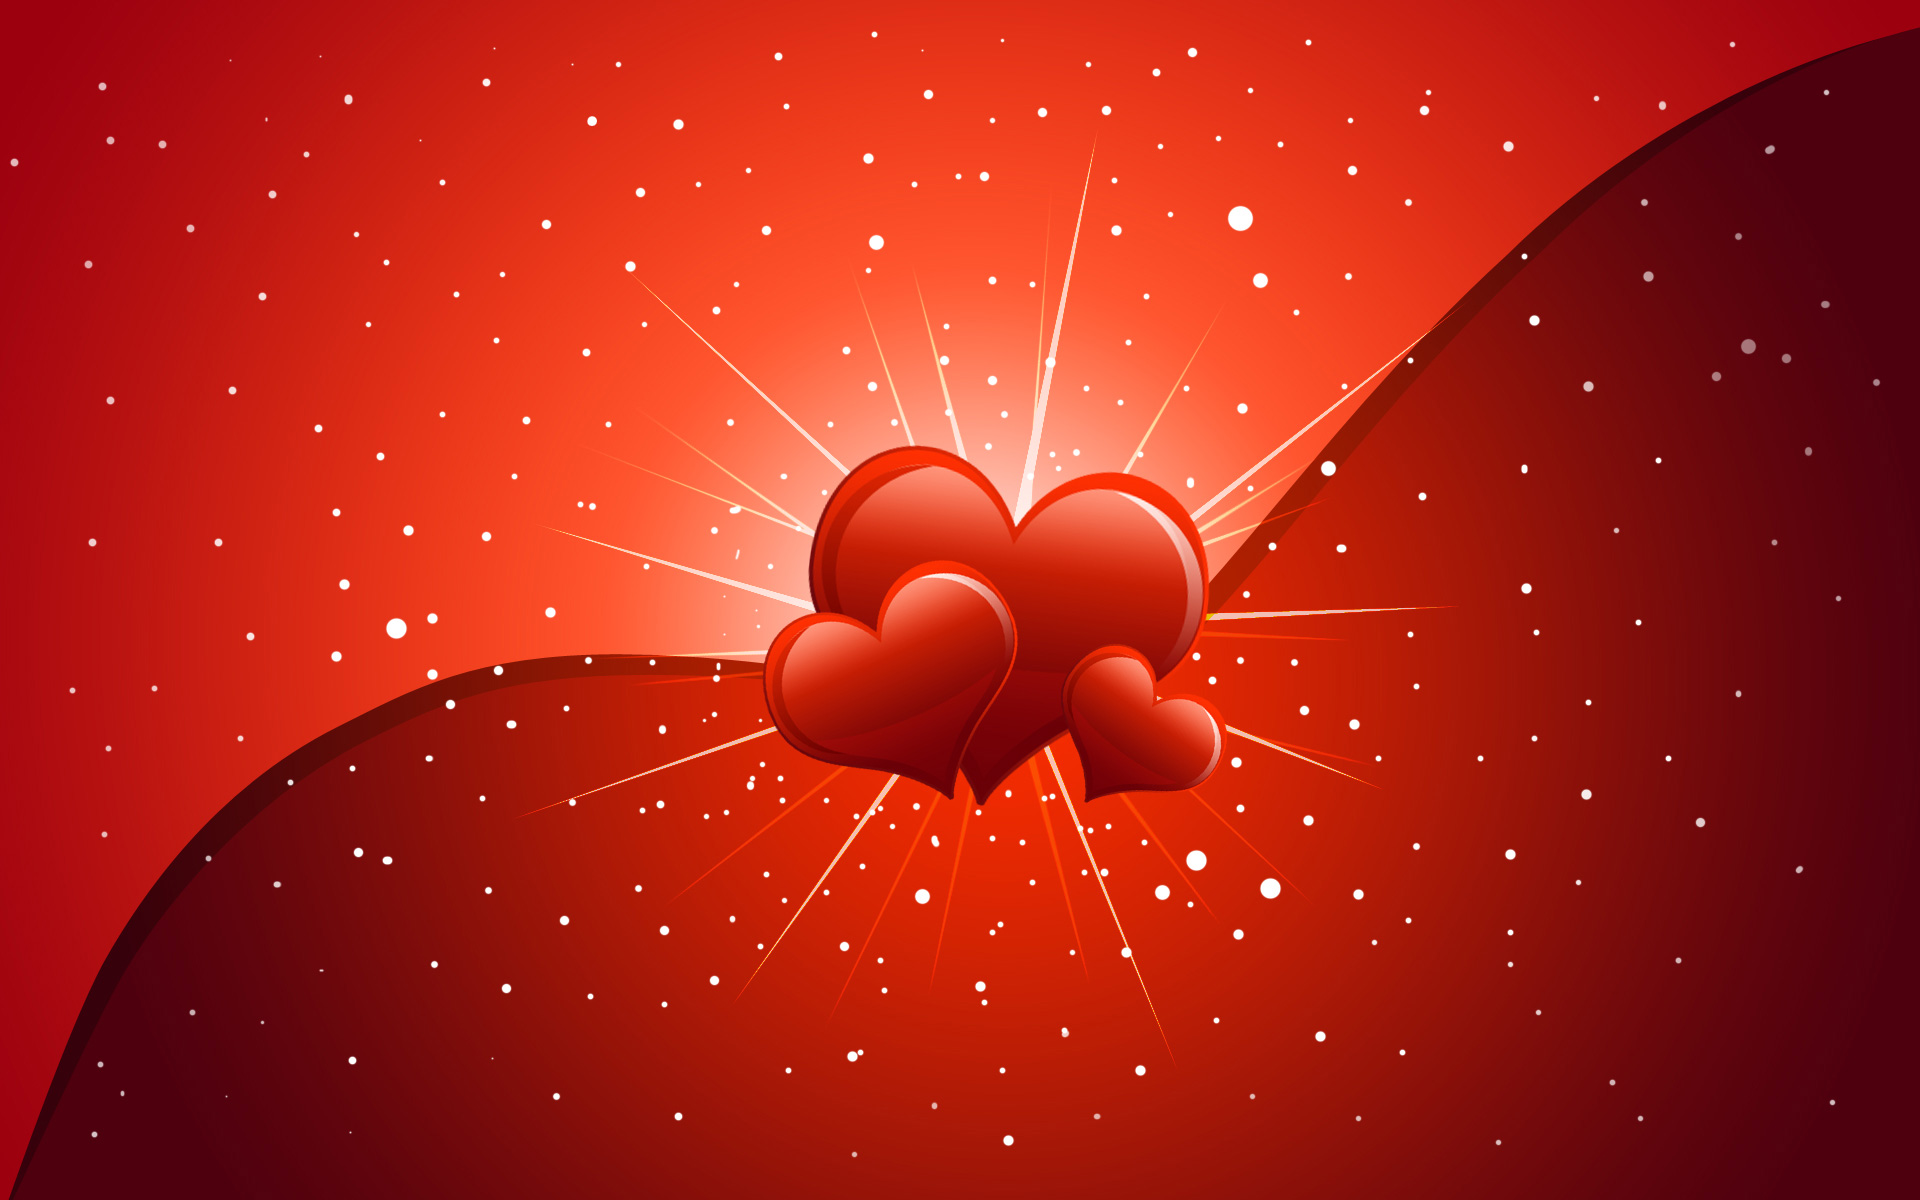 wallpaper romantic valentines day hd wallpapers romantic valentines 1920x1200